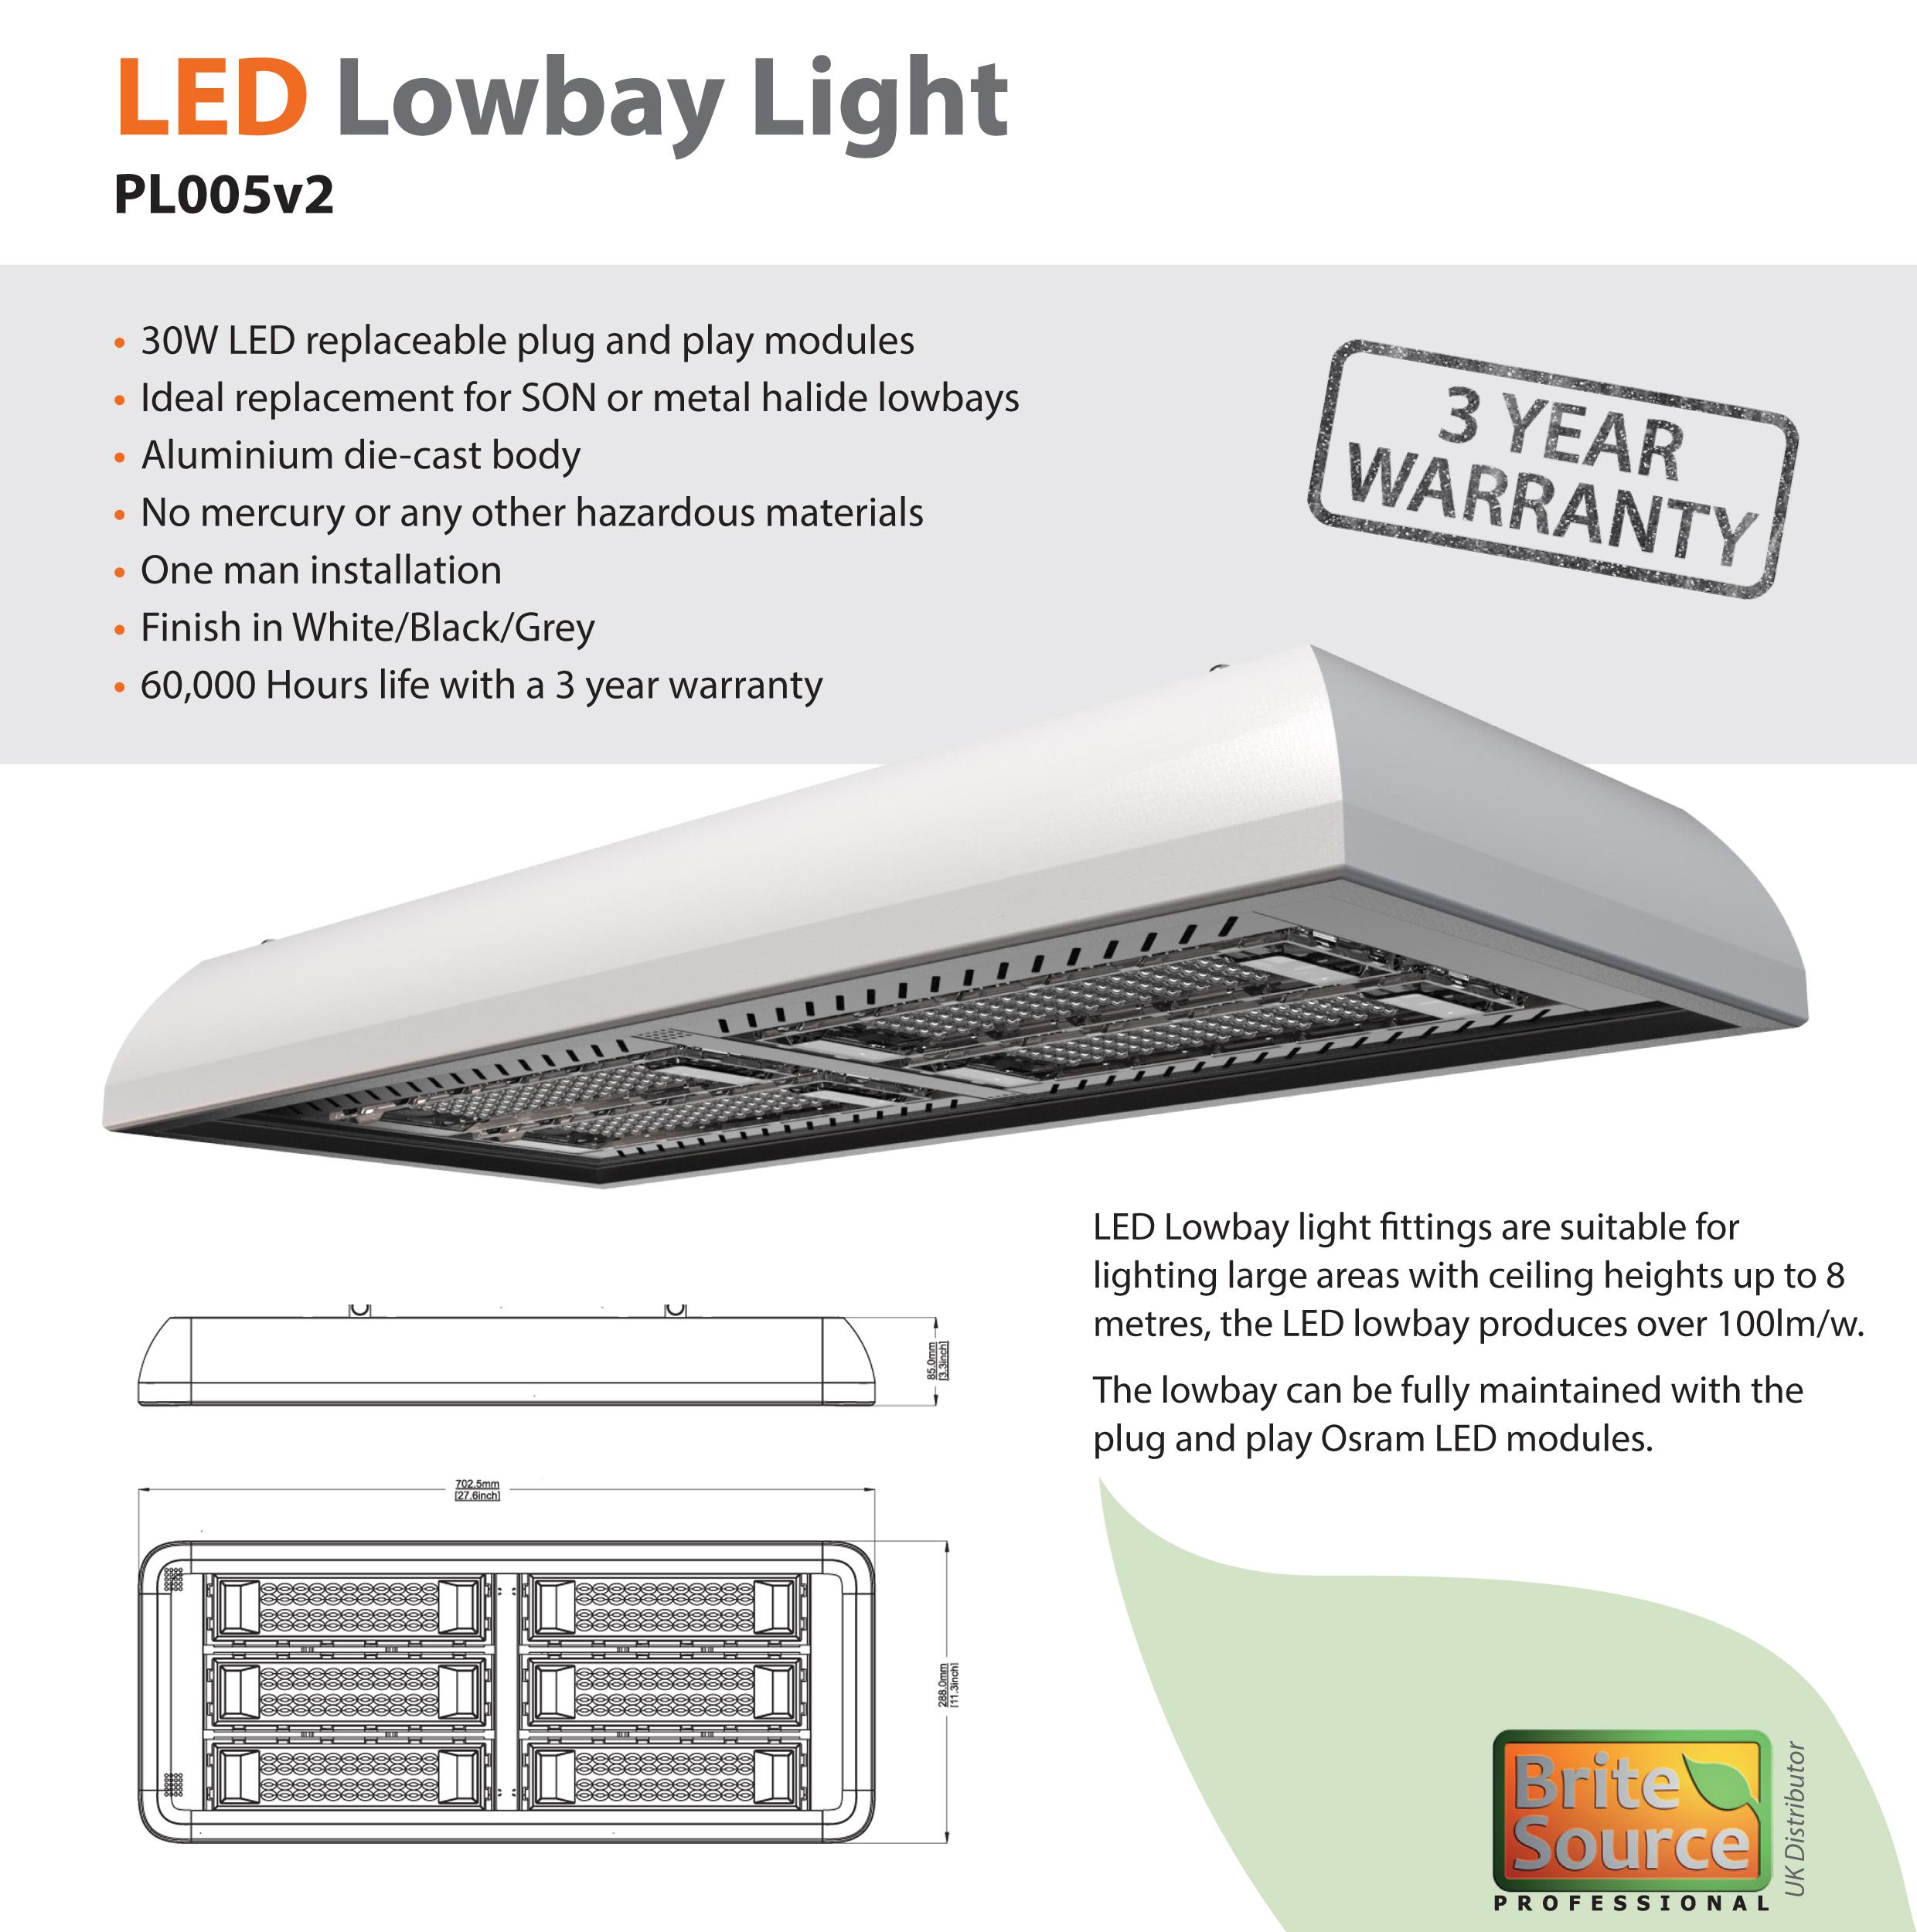 19,800 Lumen 180w LED Lowbay [5700k]